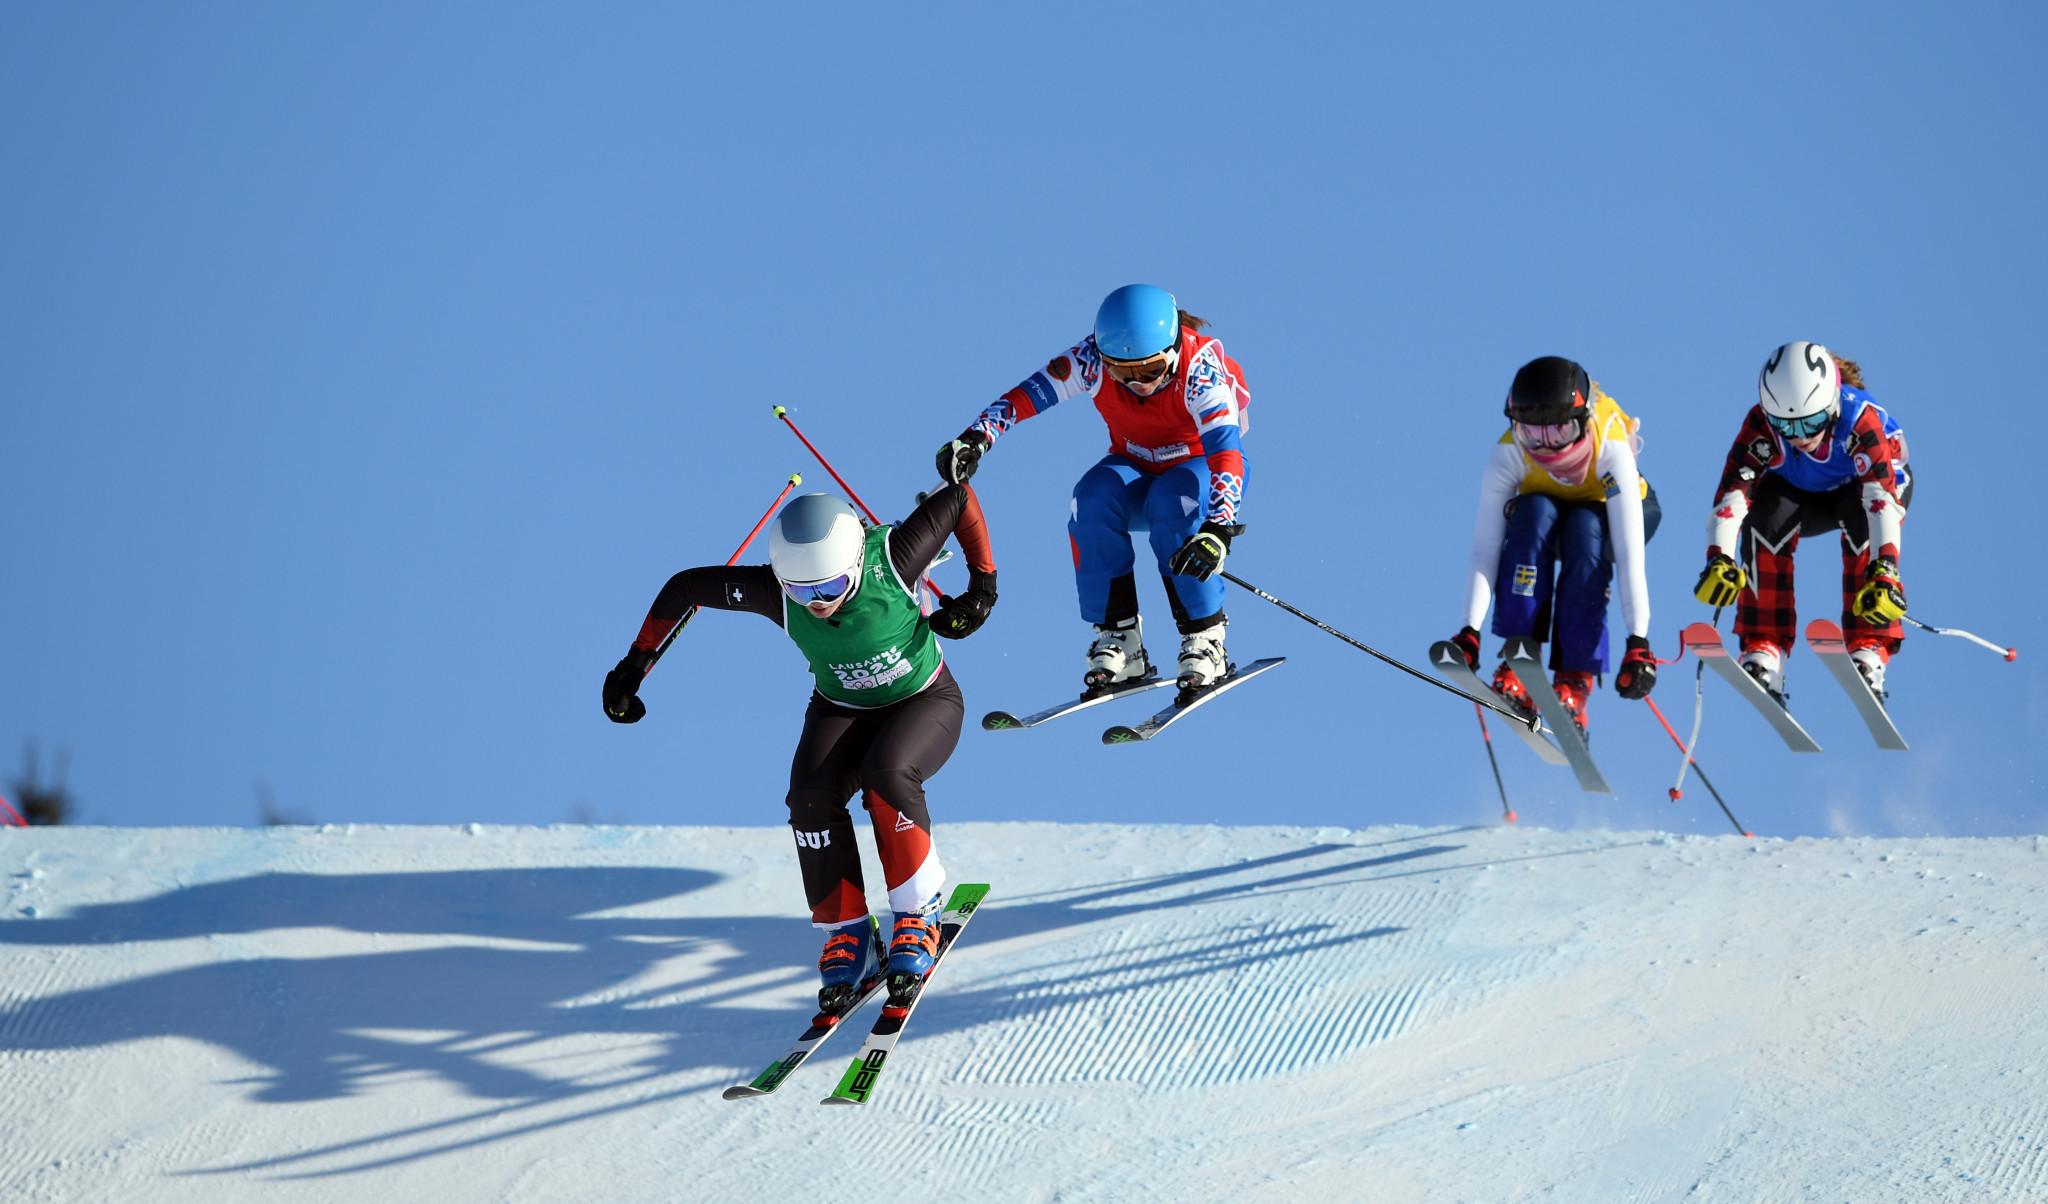 Marie-Karoline Krista won the women's ski cross final ©Getty Images